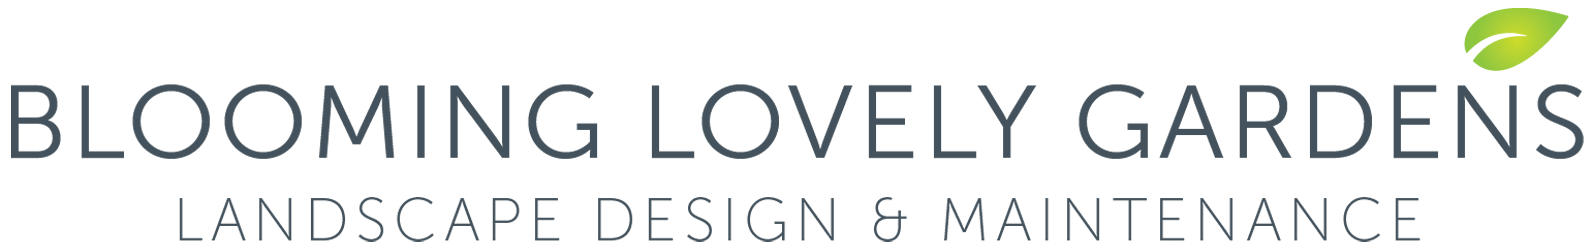 Jill Mepham Graphic Design